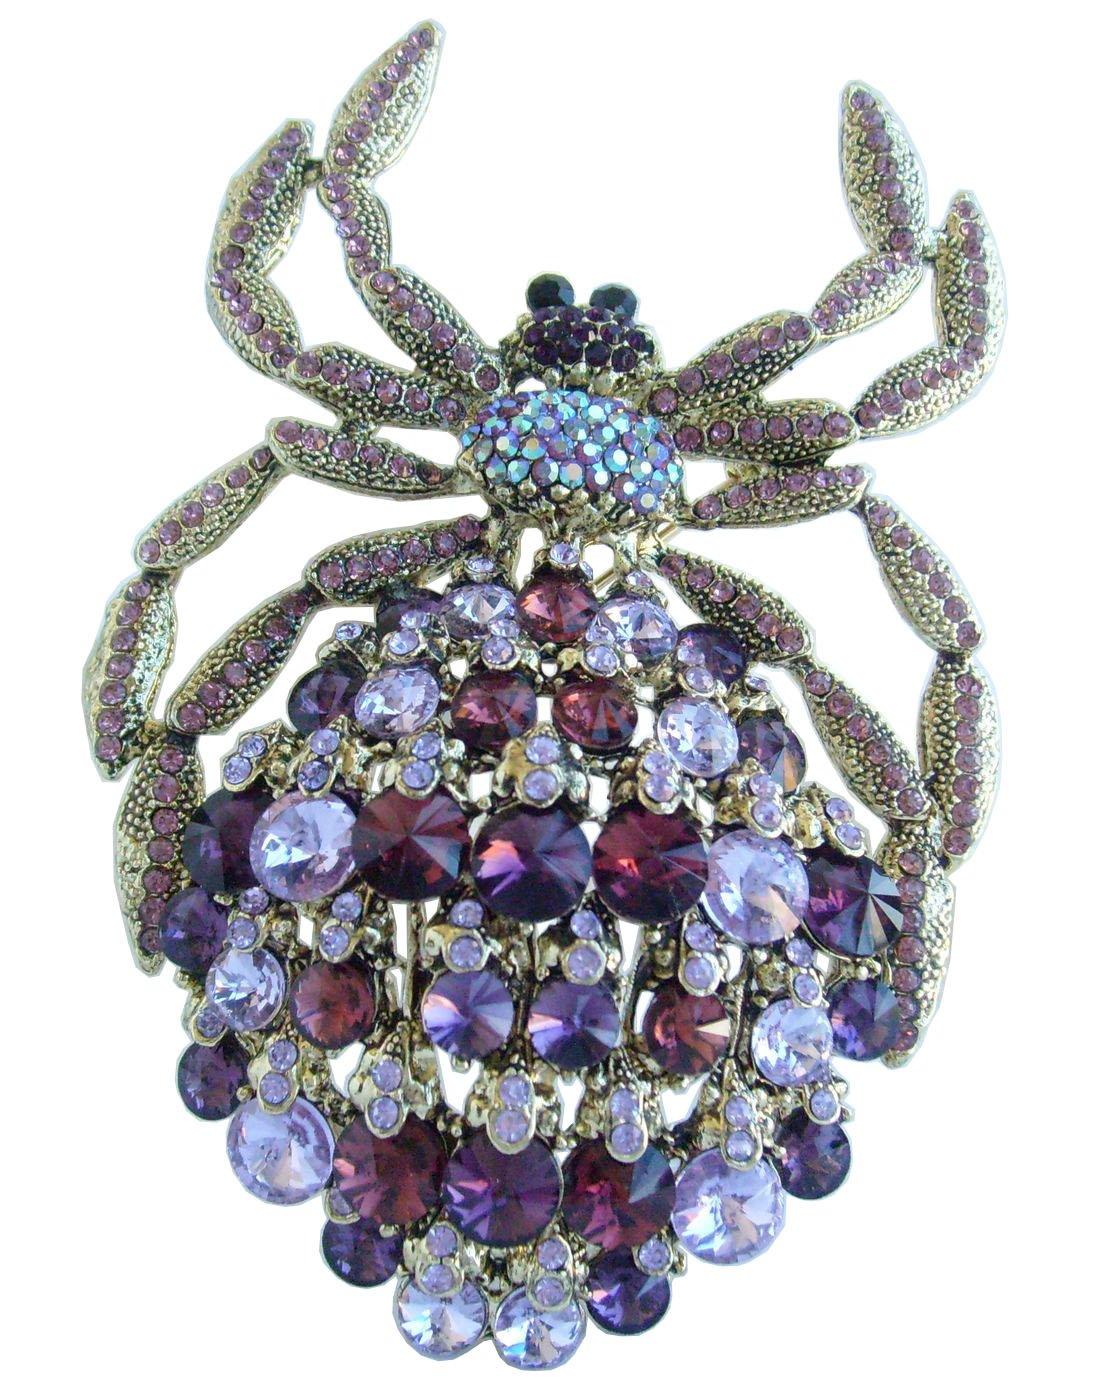 Sindary Gorgeous 4.33'' Rhinestone Crystal Spider Brooch Pin Pendant BZ4792 (Gold-Tone Purple)